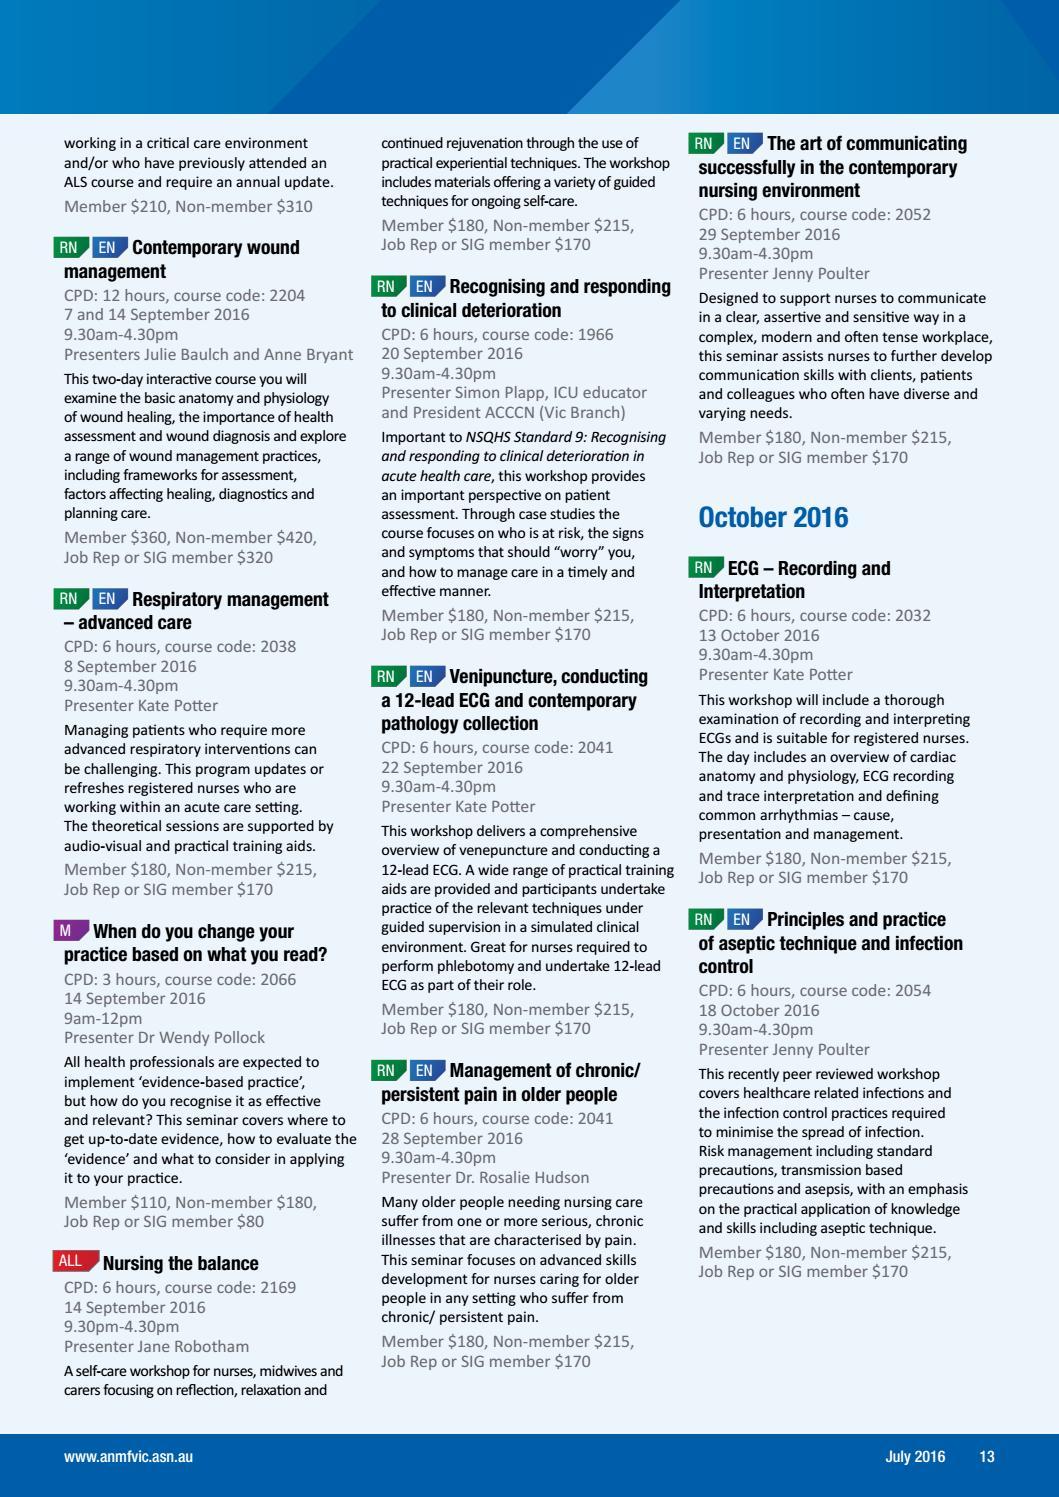 2016 OTR July by Australian Nursing and Midwifery Federation